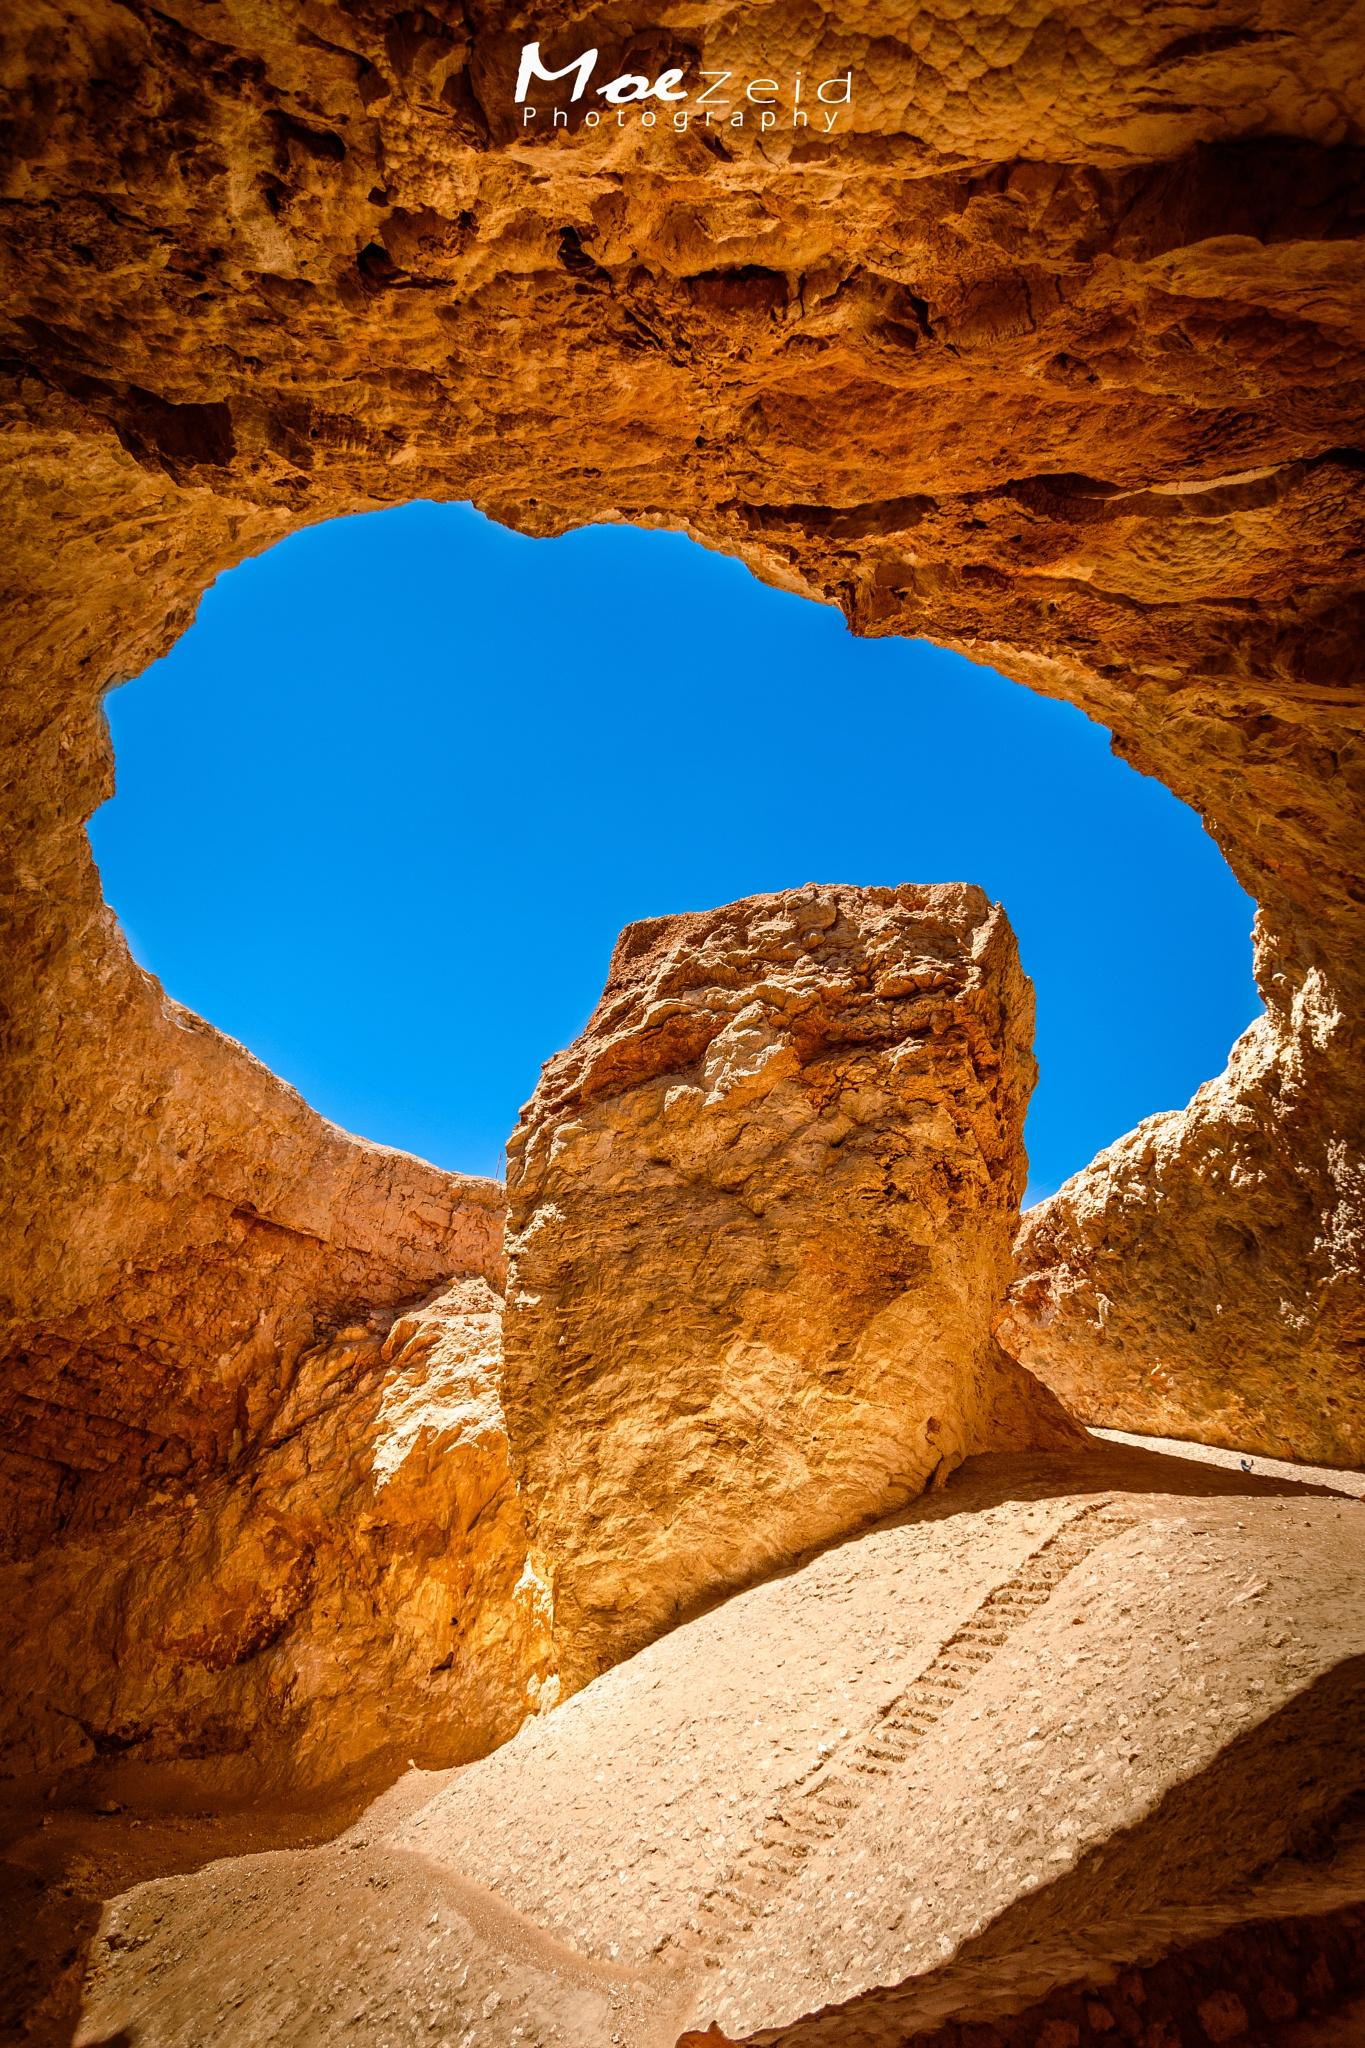 Snnour Cave by Moe Zeid